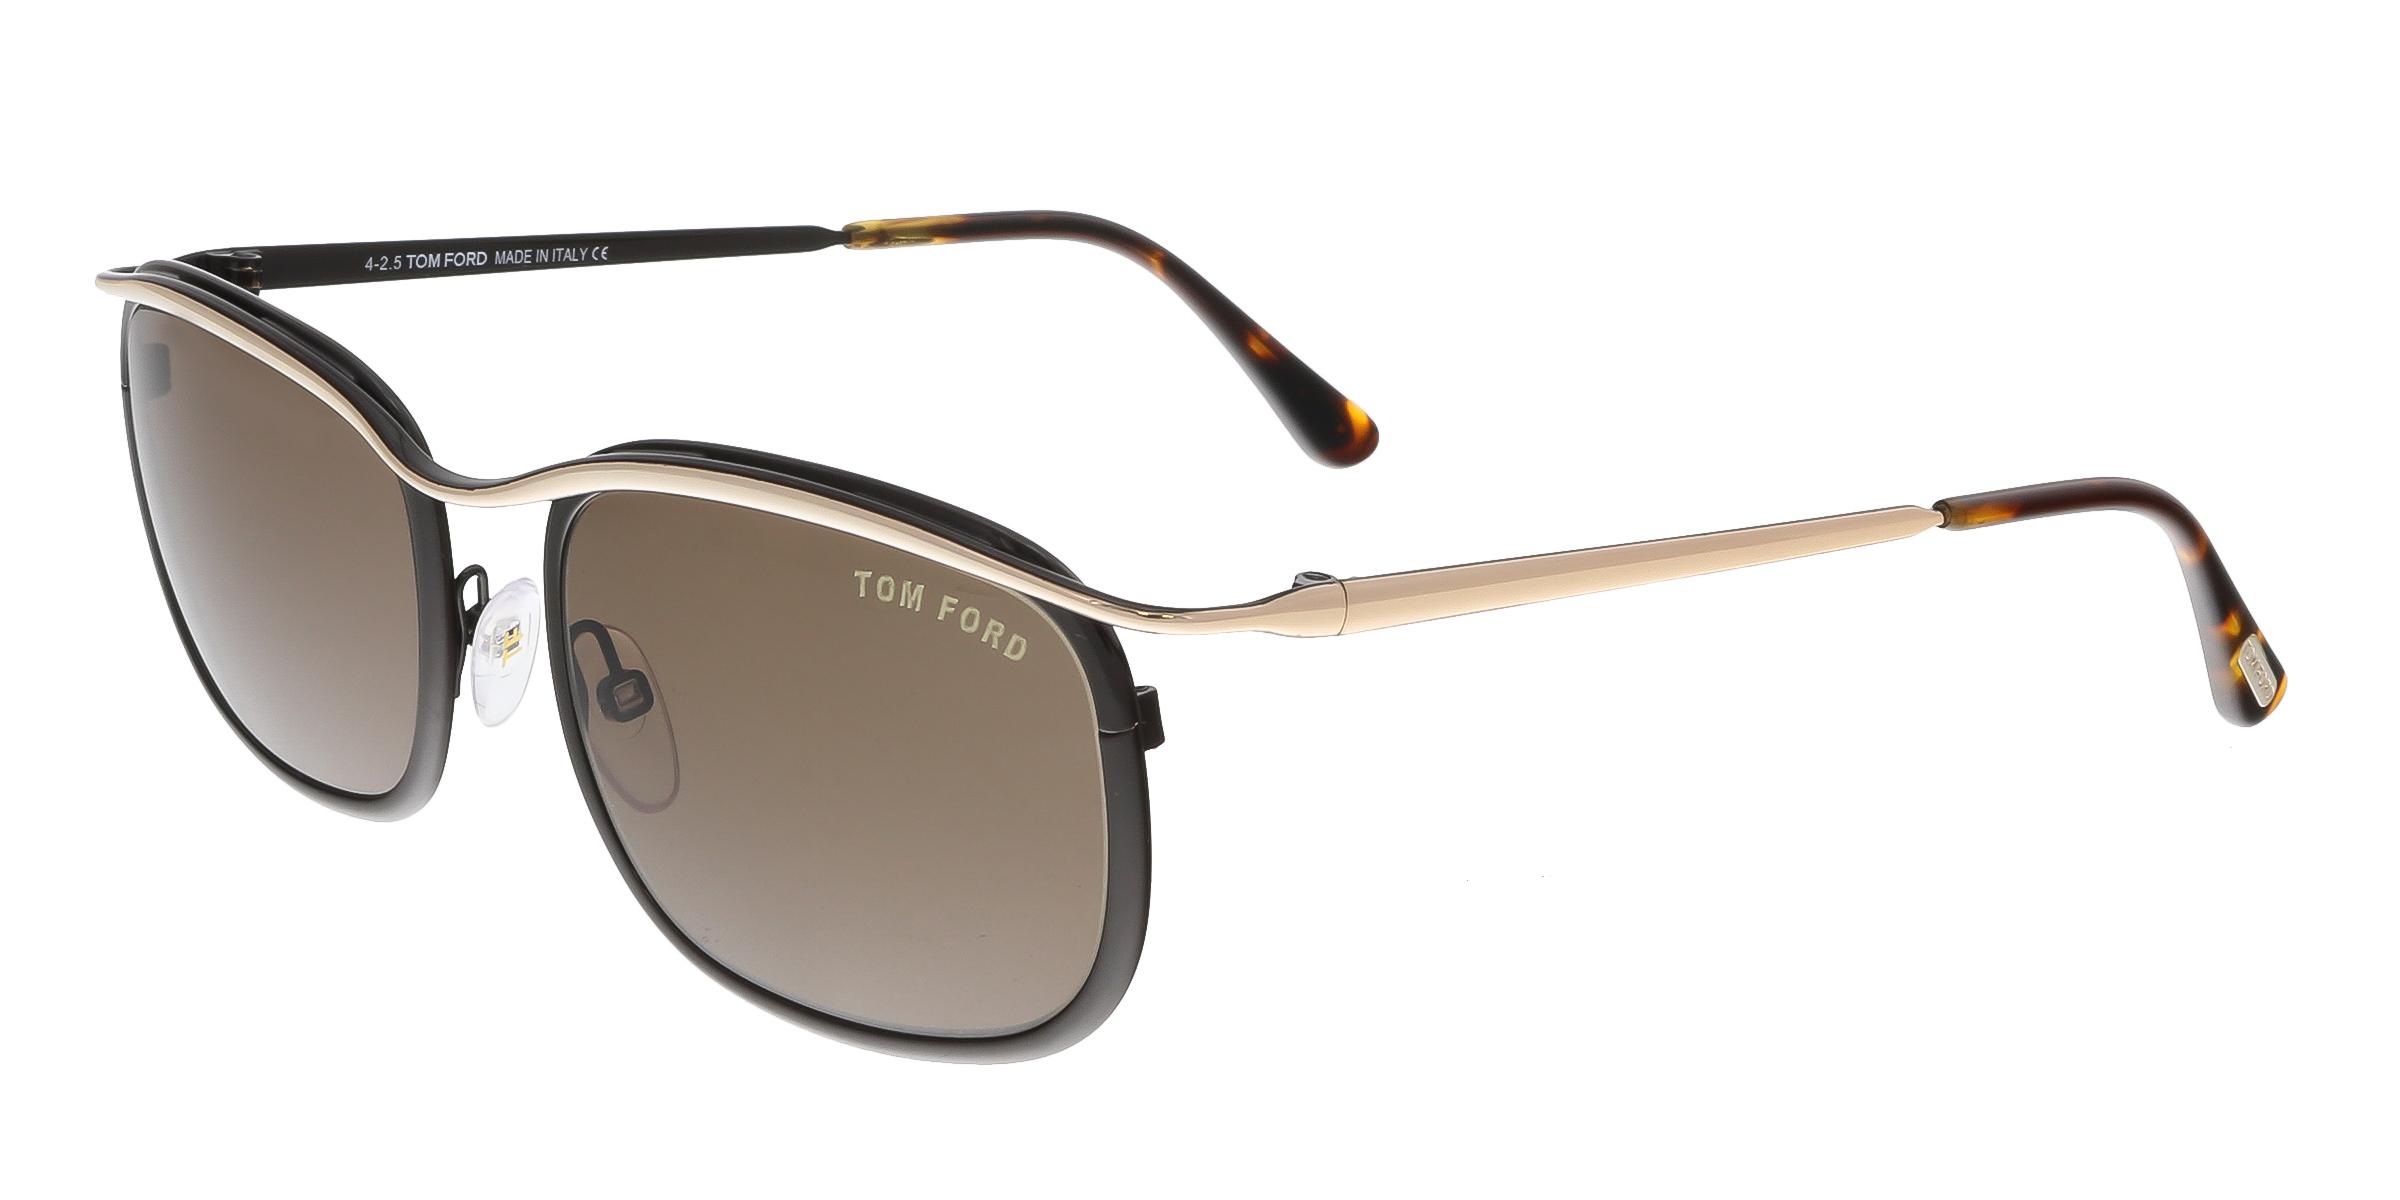 Tom Ford FT0419 50J MARCELLO Brown Rectangle Sunglasses